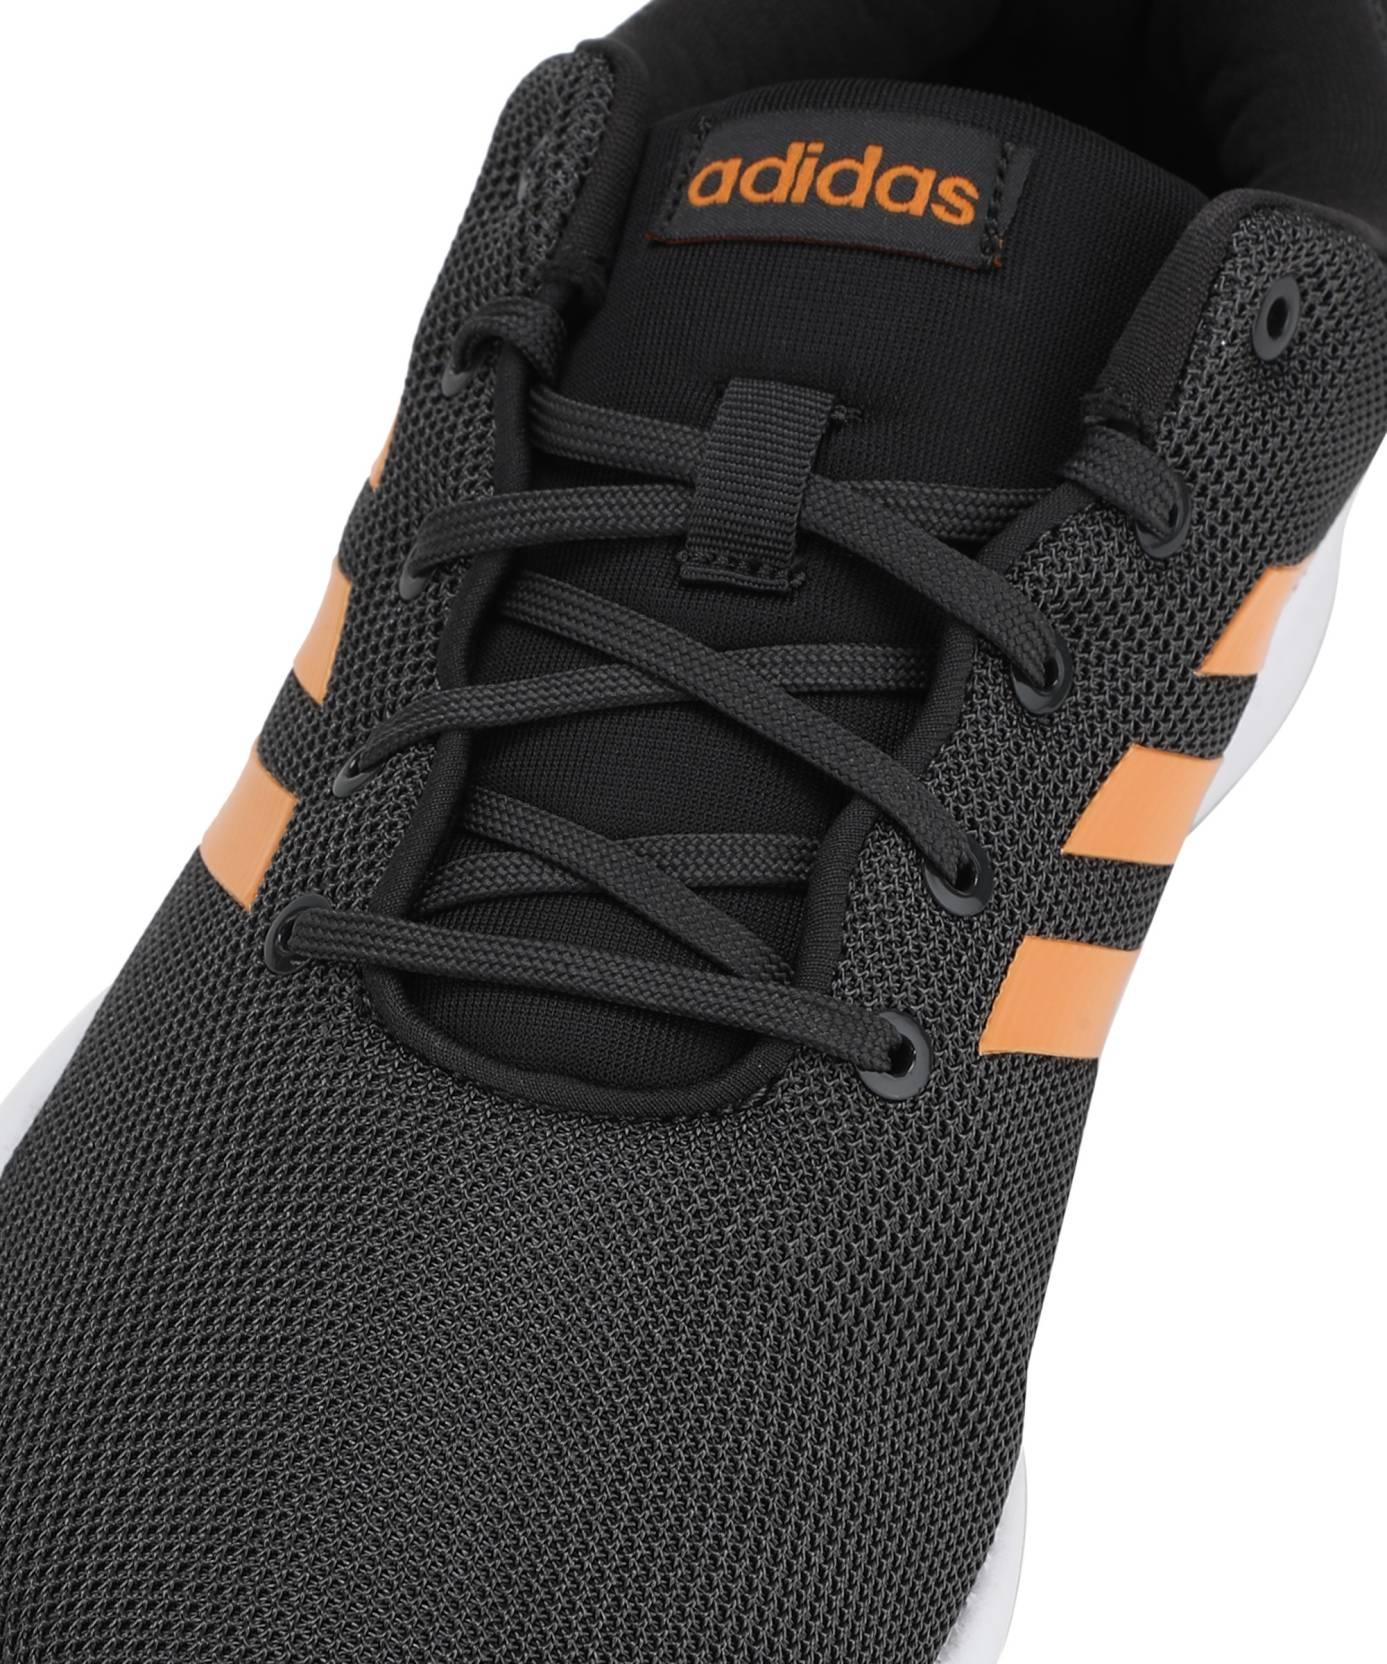 adidas sooj price